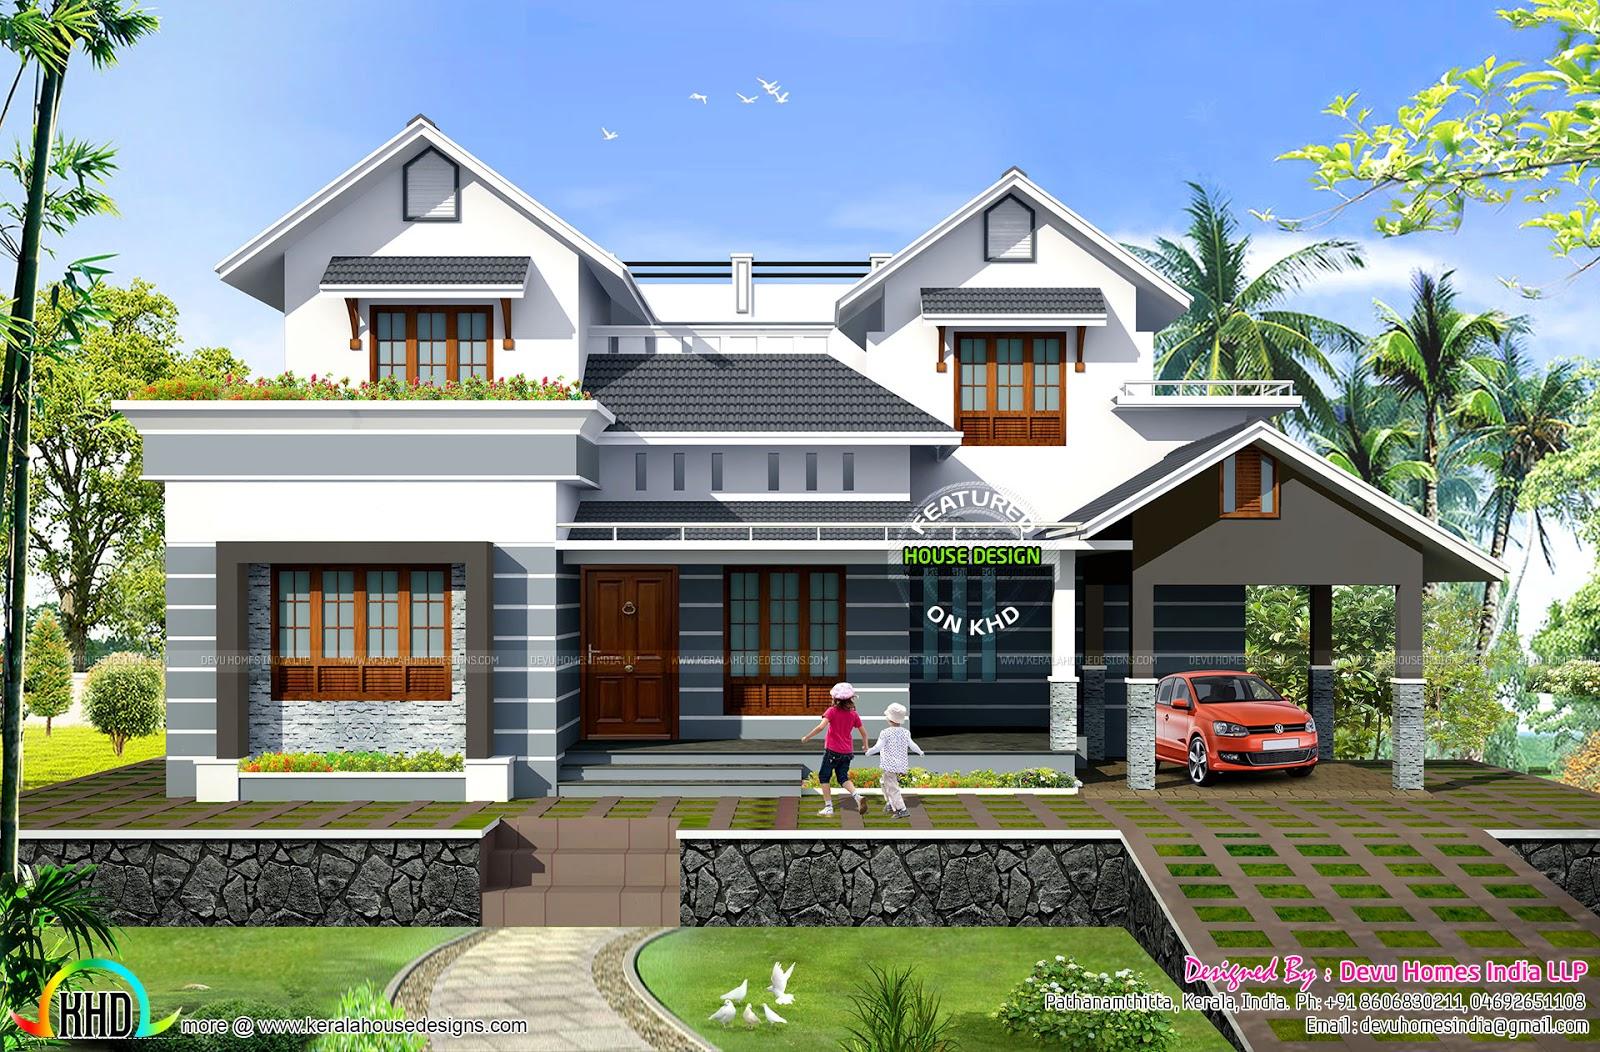 24 x 36 garage floor plans 25 x 12 floor plans house for Home architecture quiz